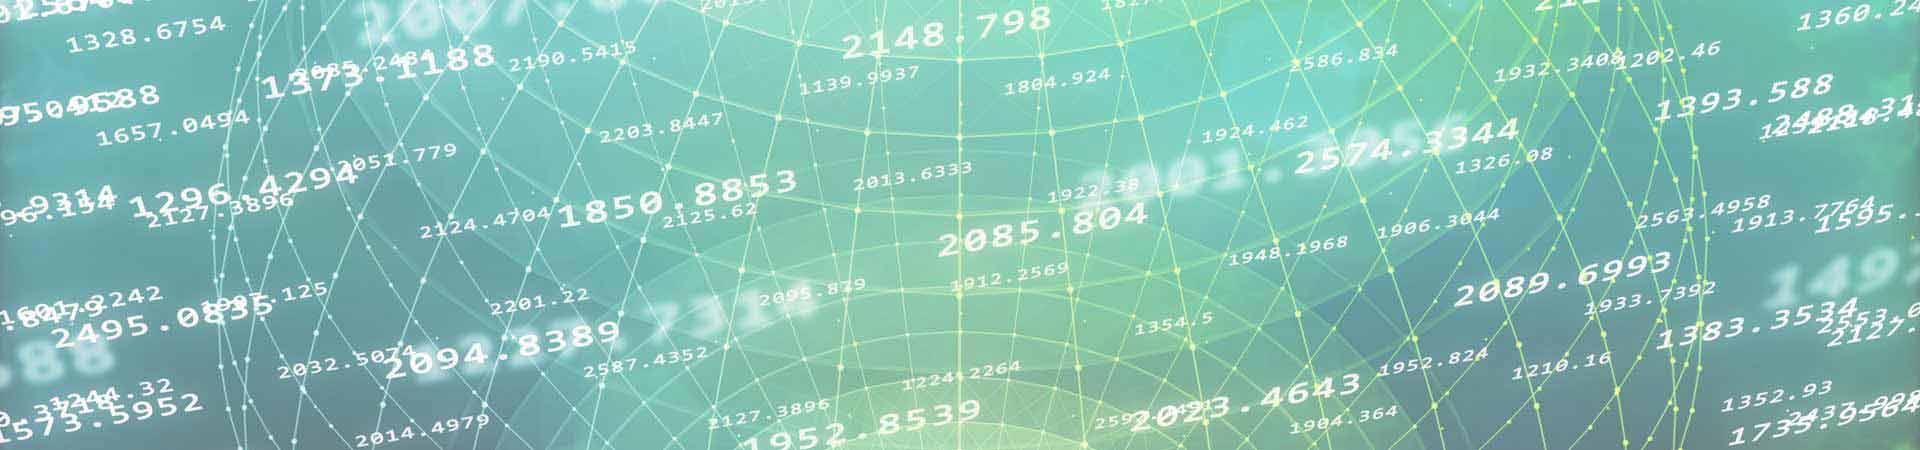 Market Data Mining